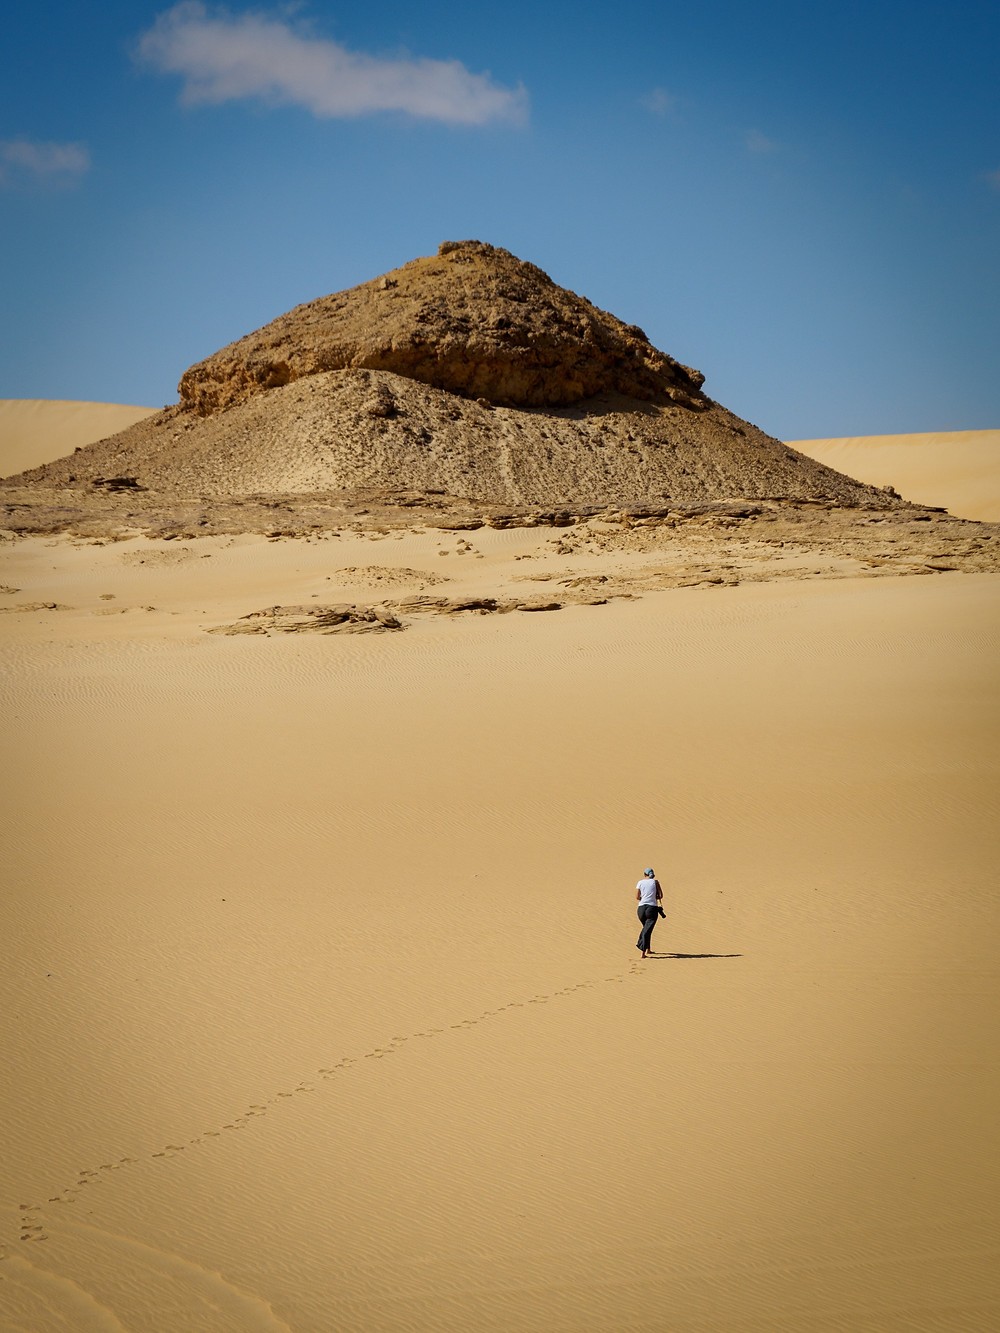 Person walks alone in desert.